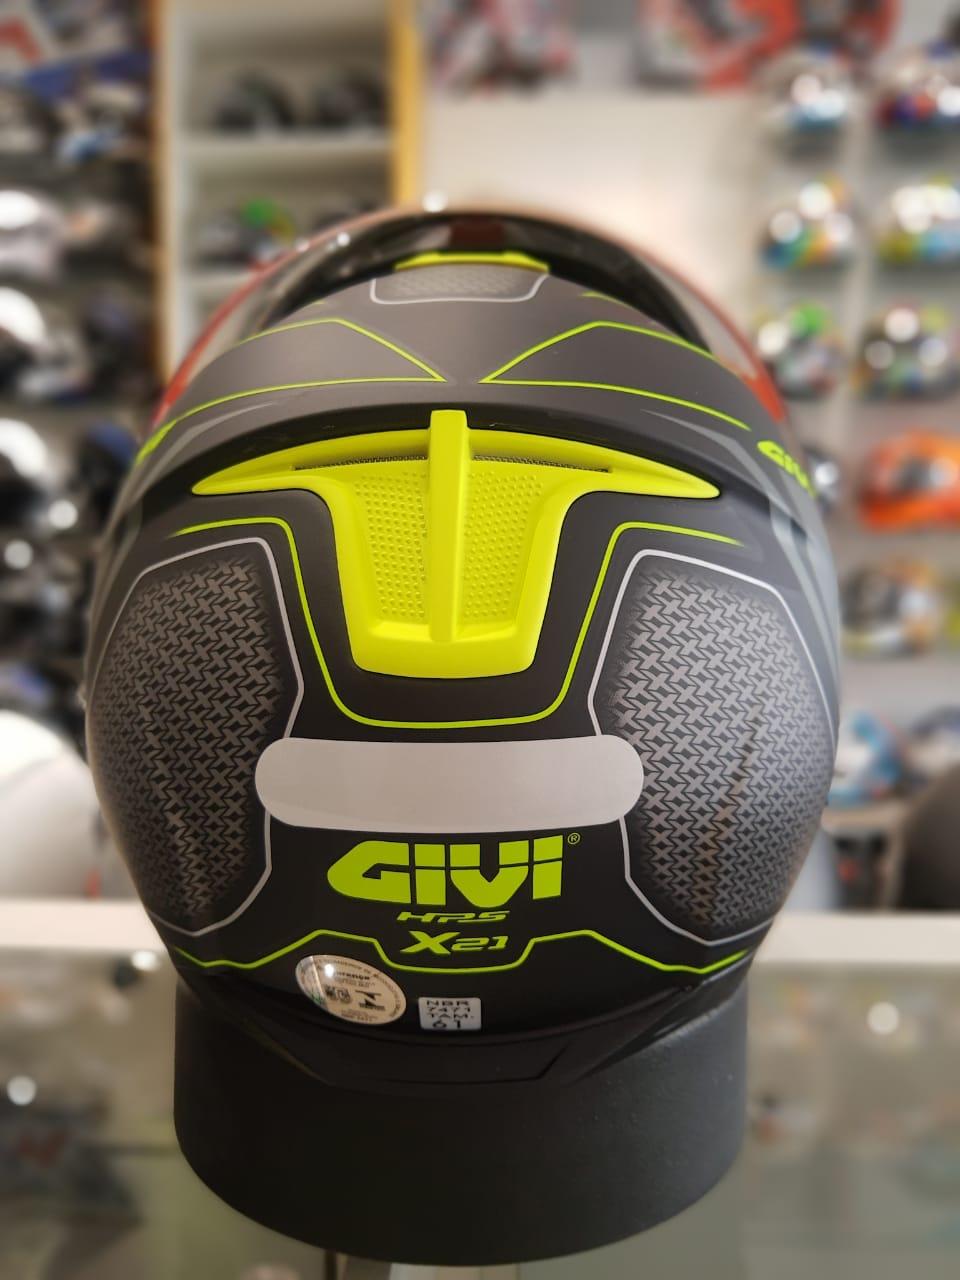 CAPACETE GIVI X21 SHIVER PRETO/ TITANIUM /AMARELO FOSCO  - Planet Bike Shop Moto Acessórios